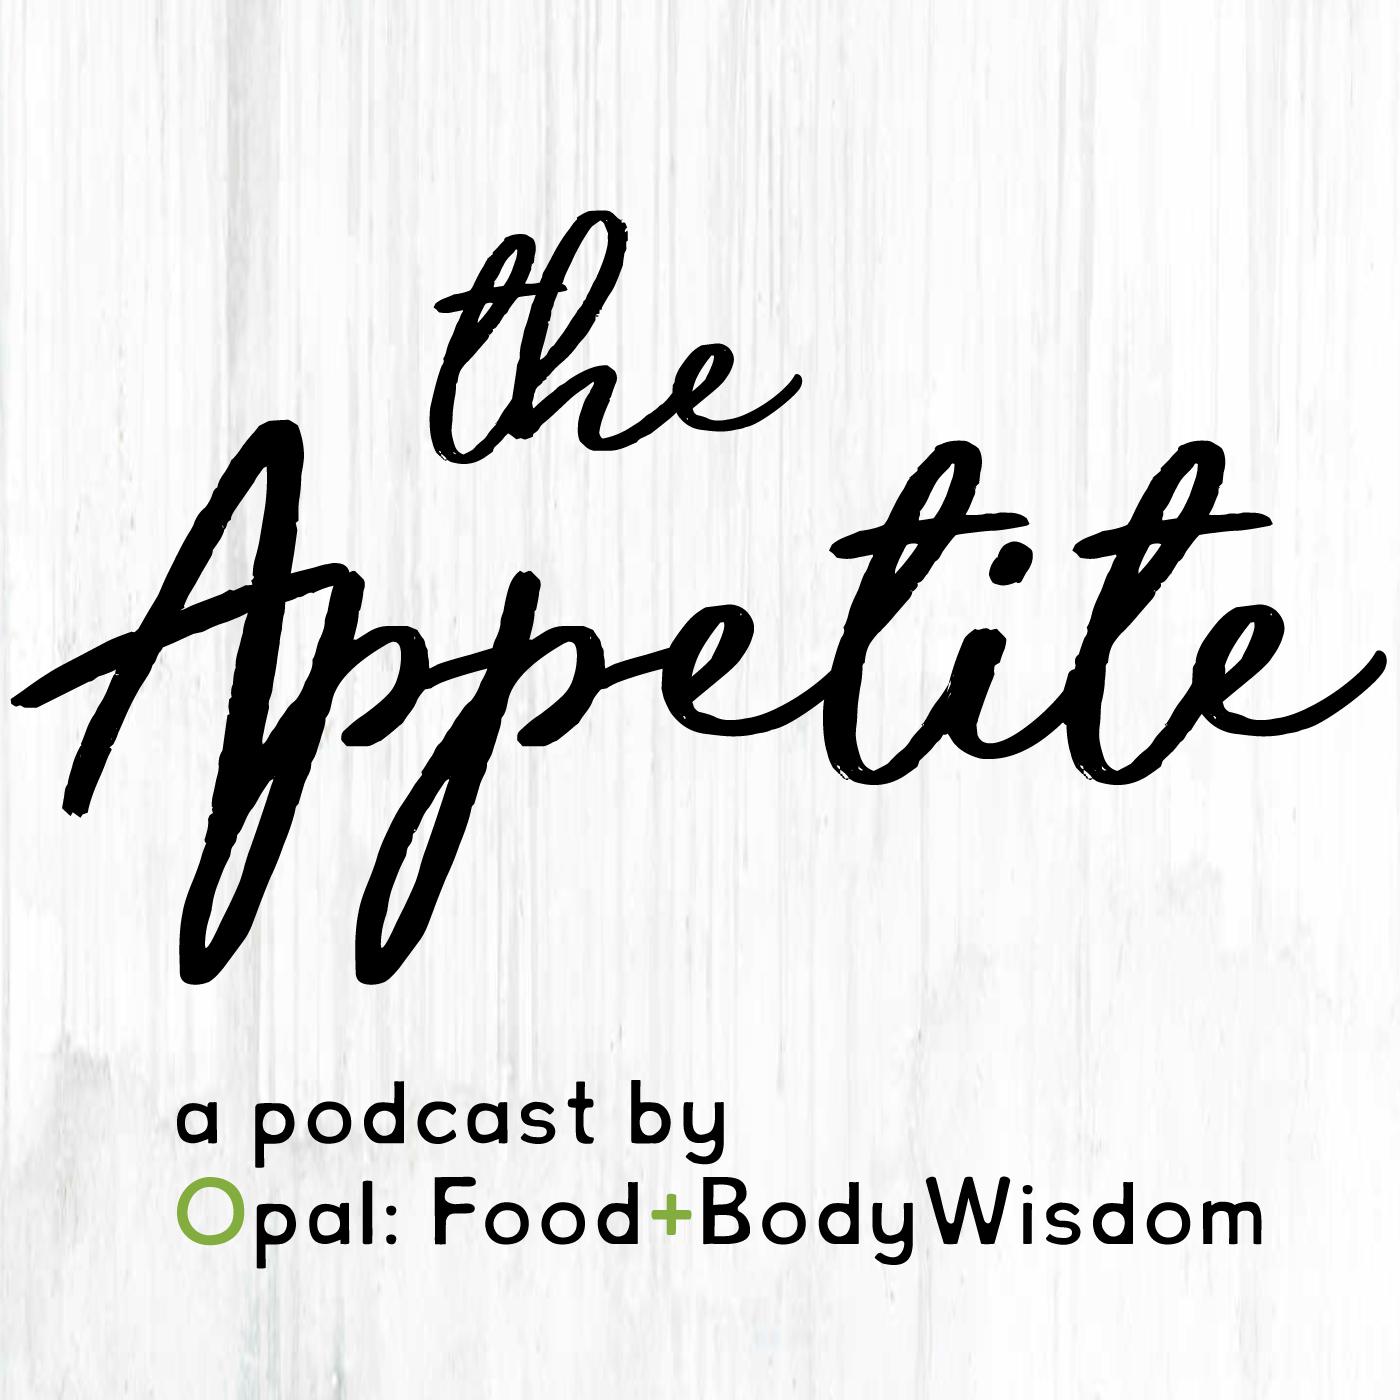 The Appetite show art